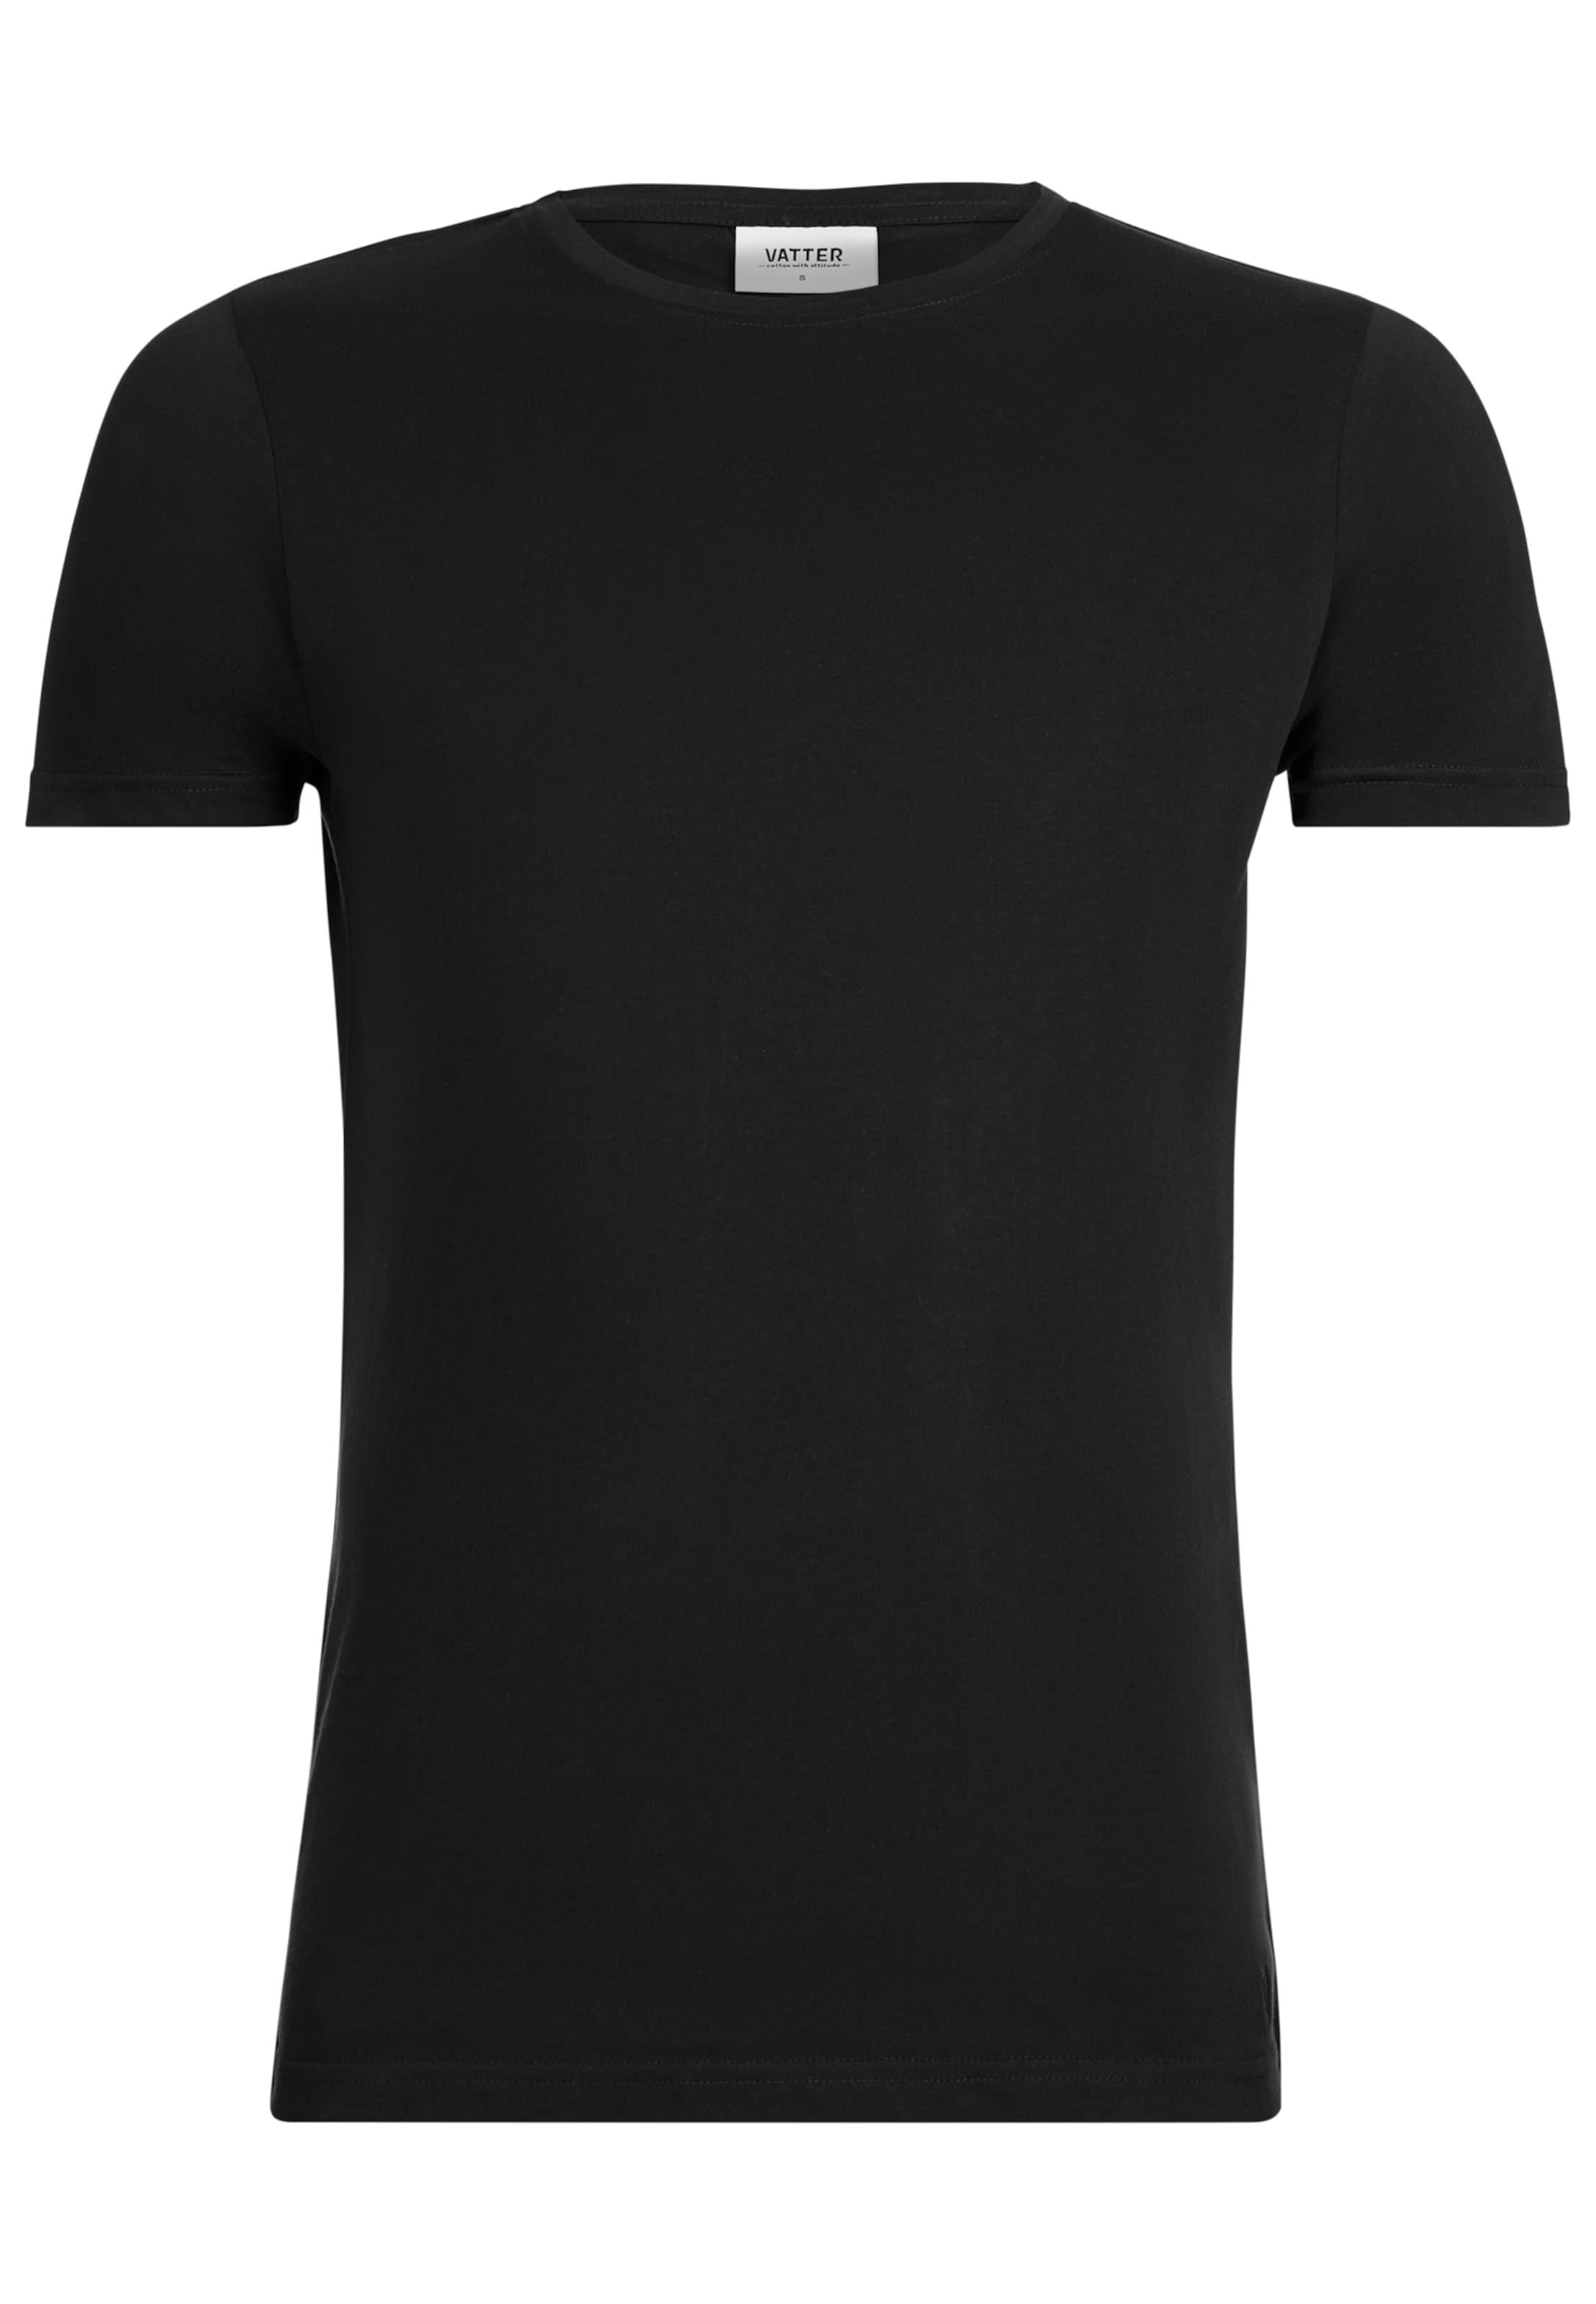 shirt In Rundhals Bob' 'basic Vatter Schwarz LSUzVpjMGq